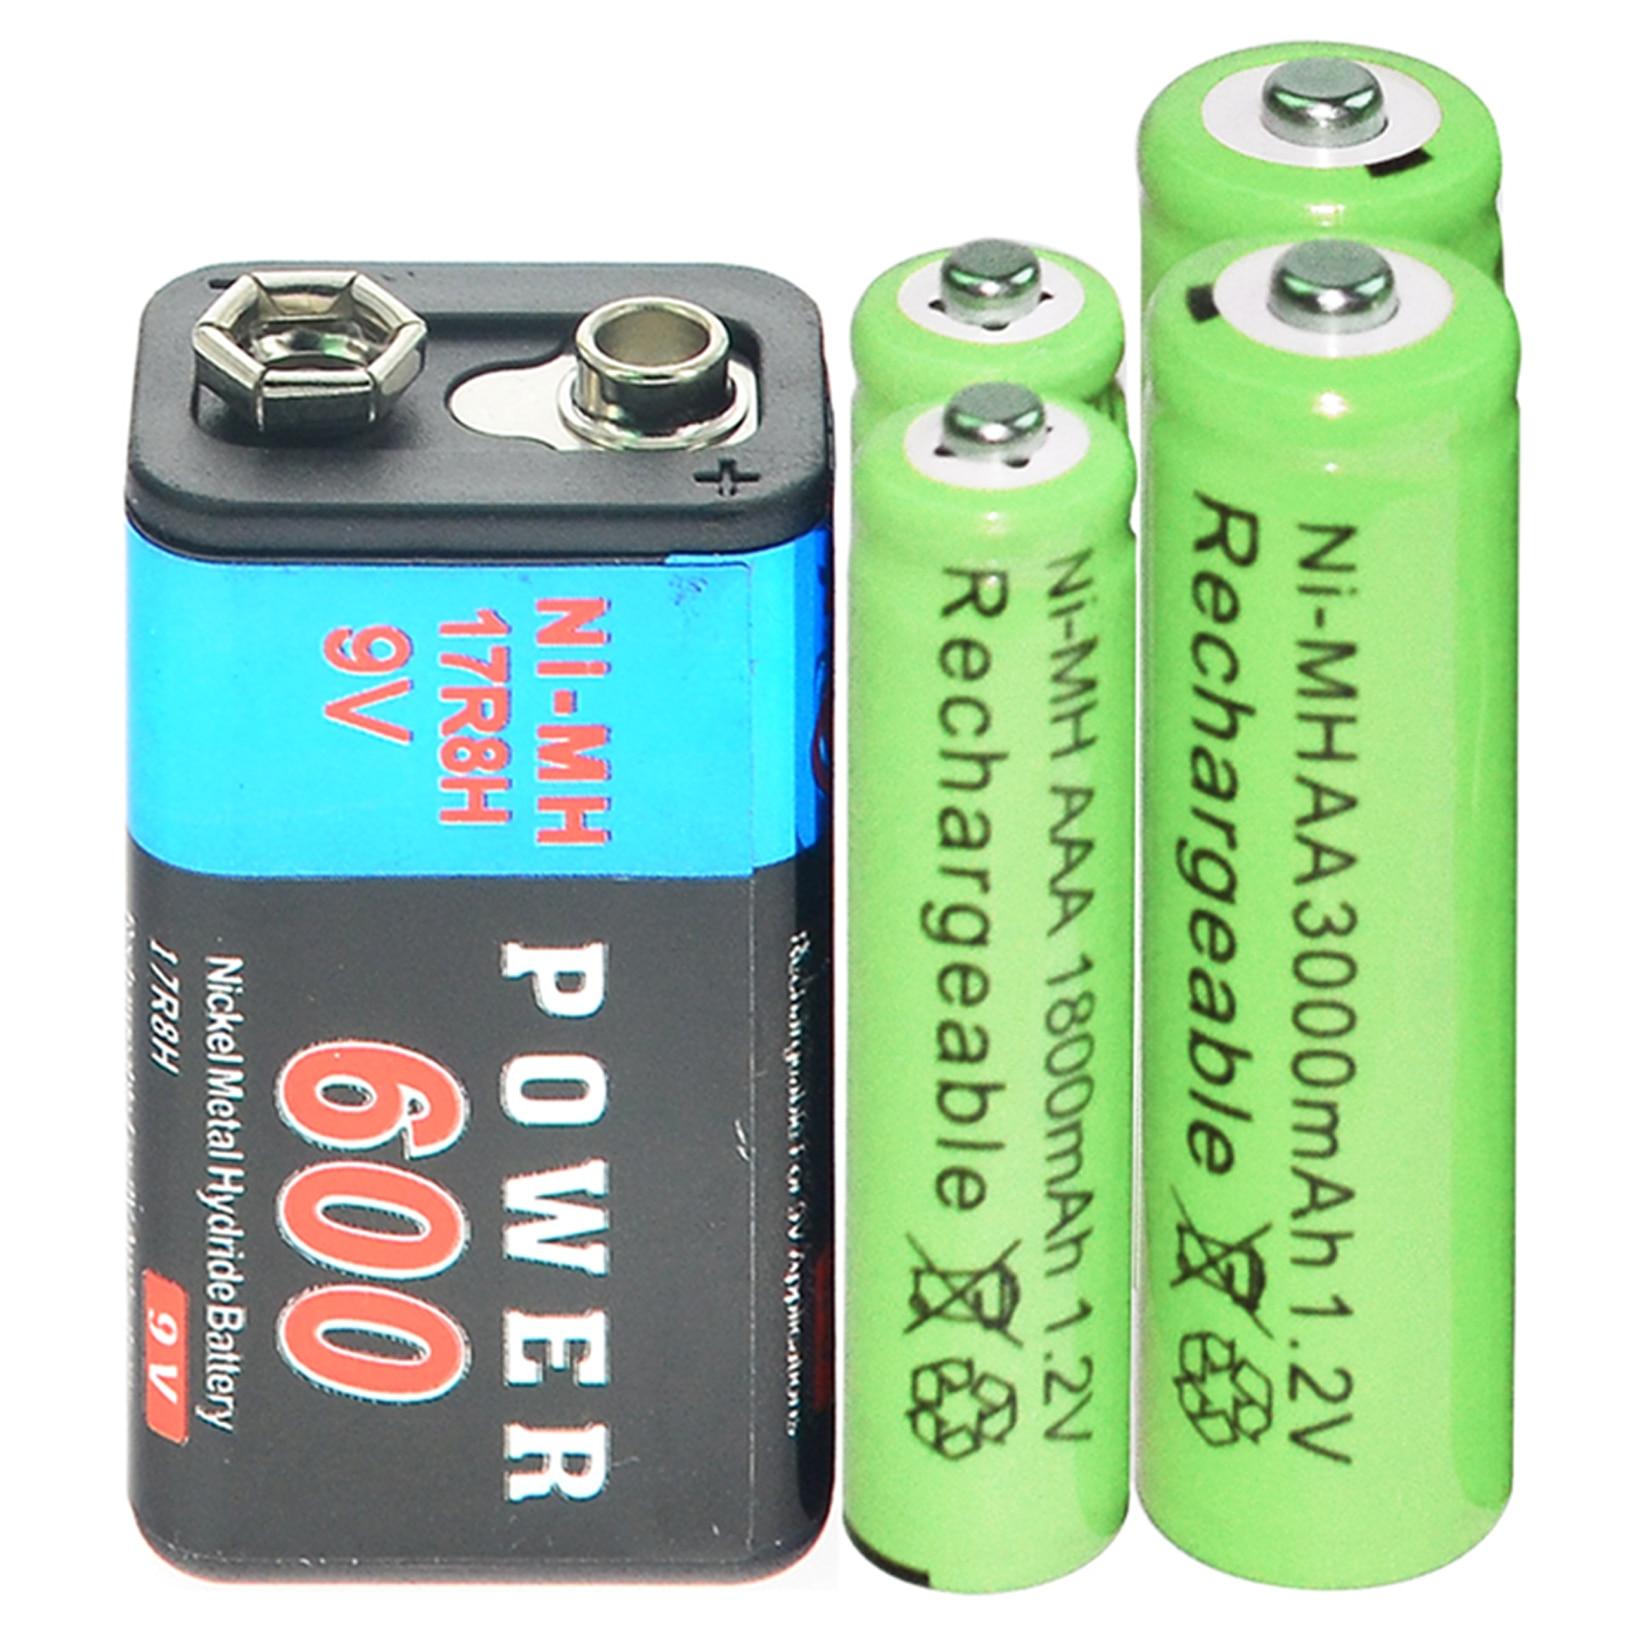 1x 9v 600mAh + 2xAA 3000mAh + 2x AAA 1800mAh 1.2V NI-MH Rechargeable Battery green